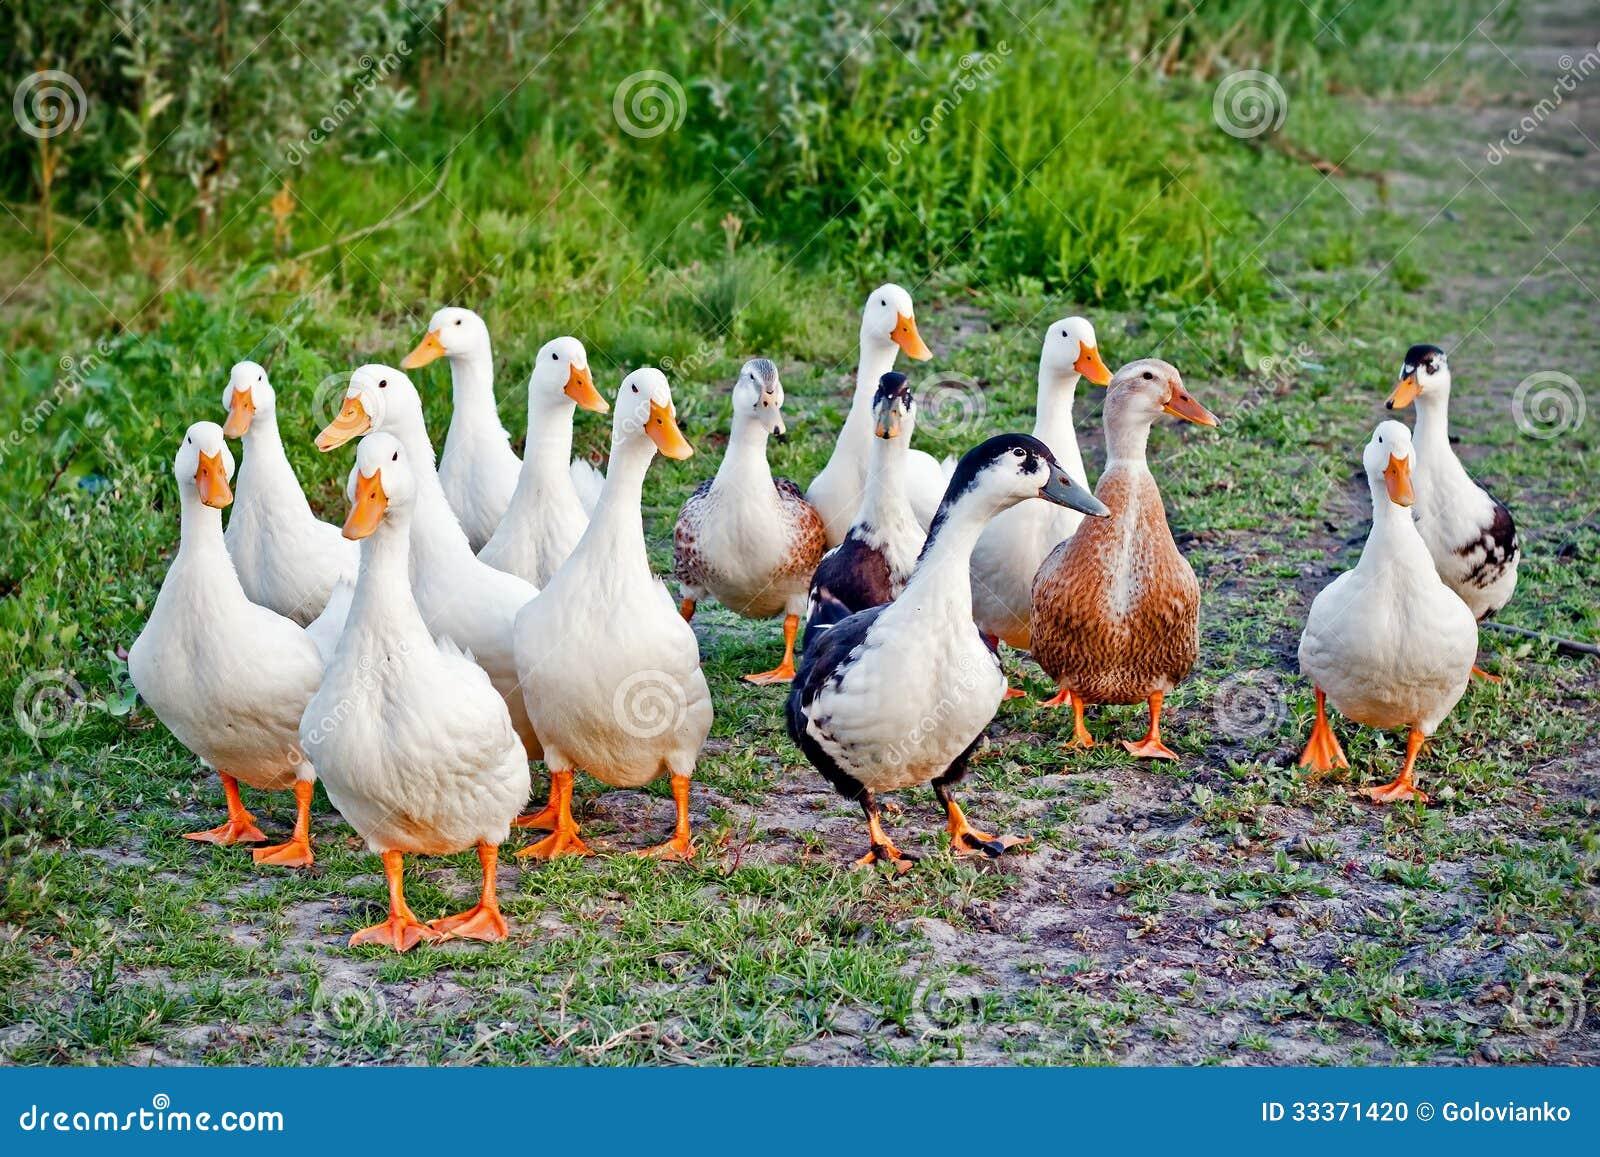 Ducks Flock Stock Photo - Image: 33371420